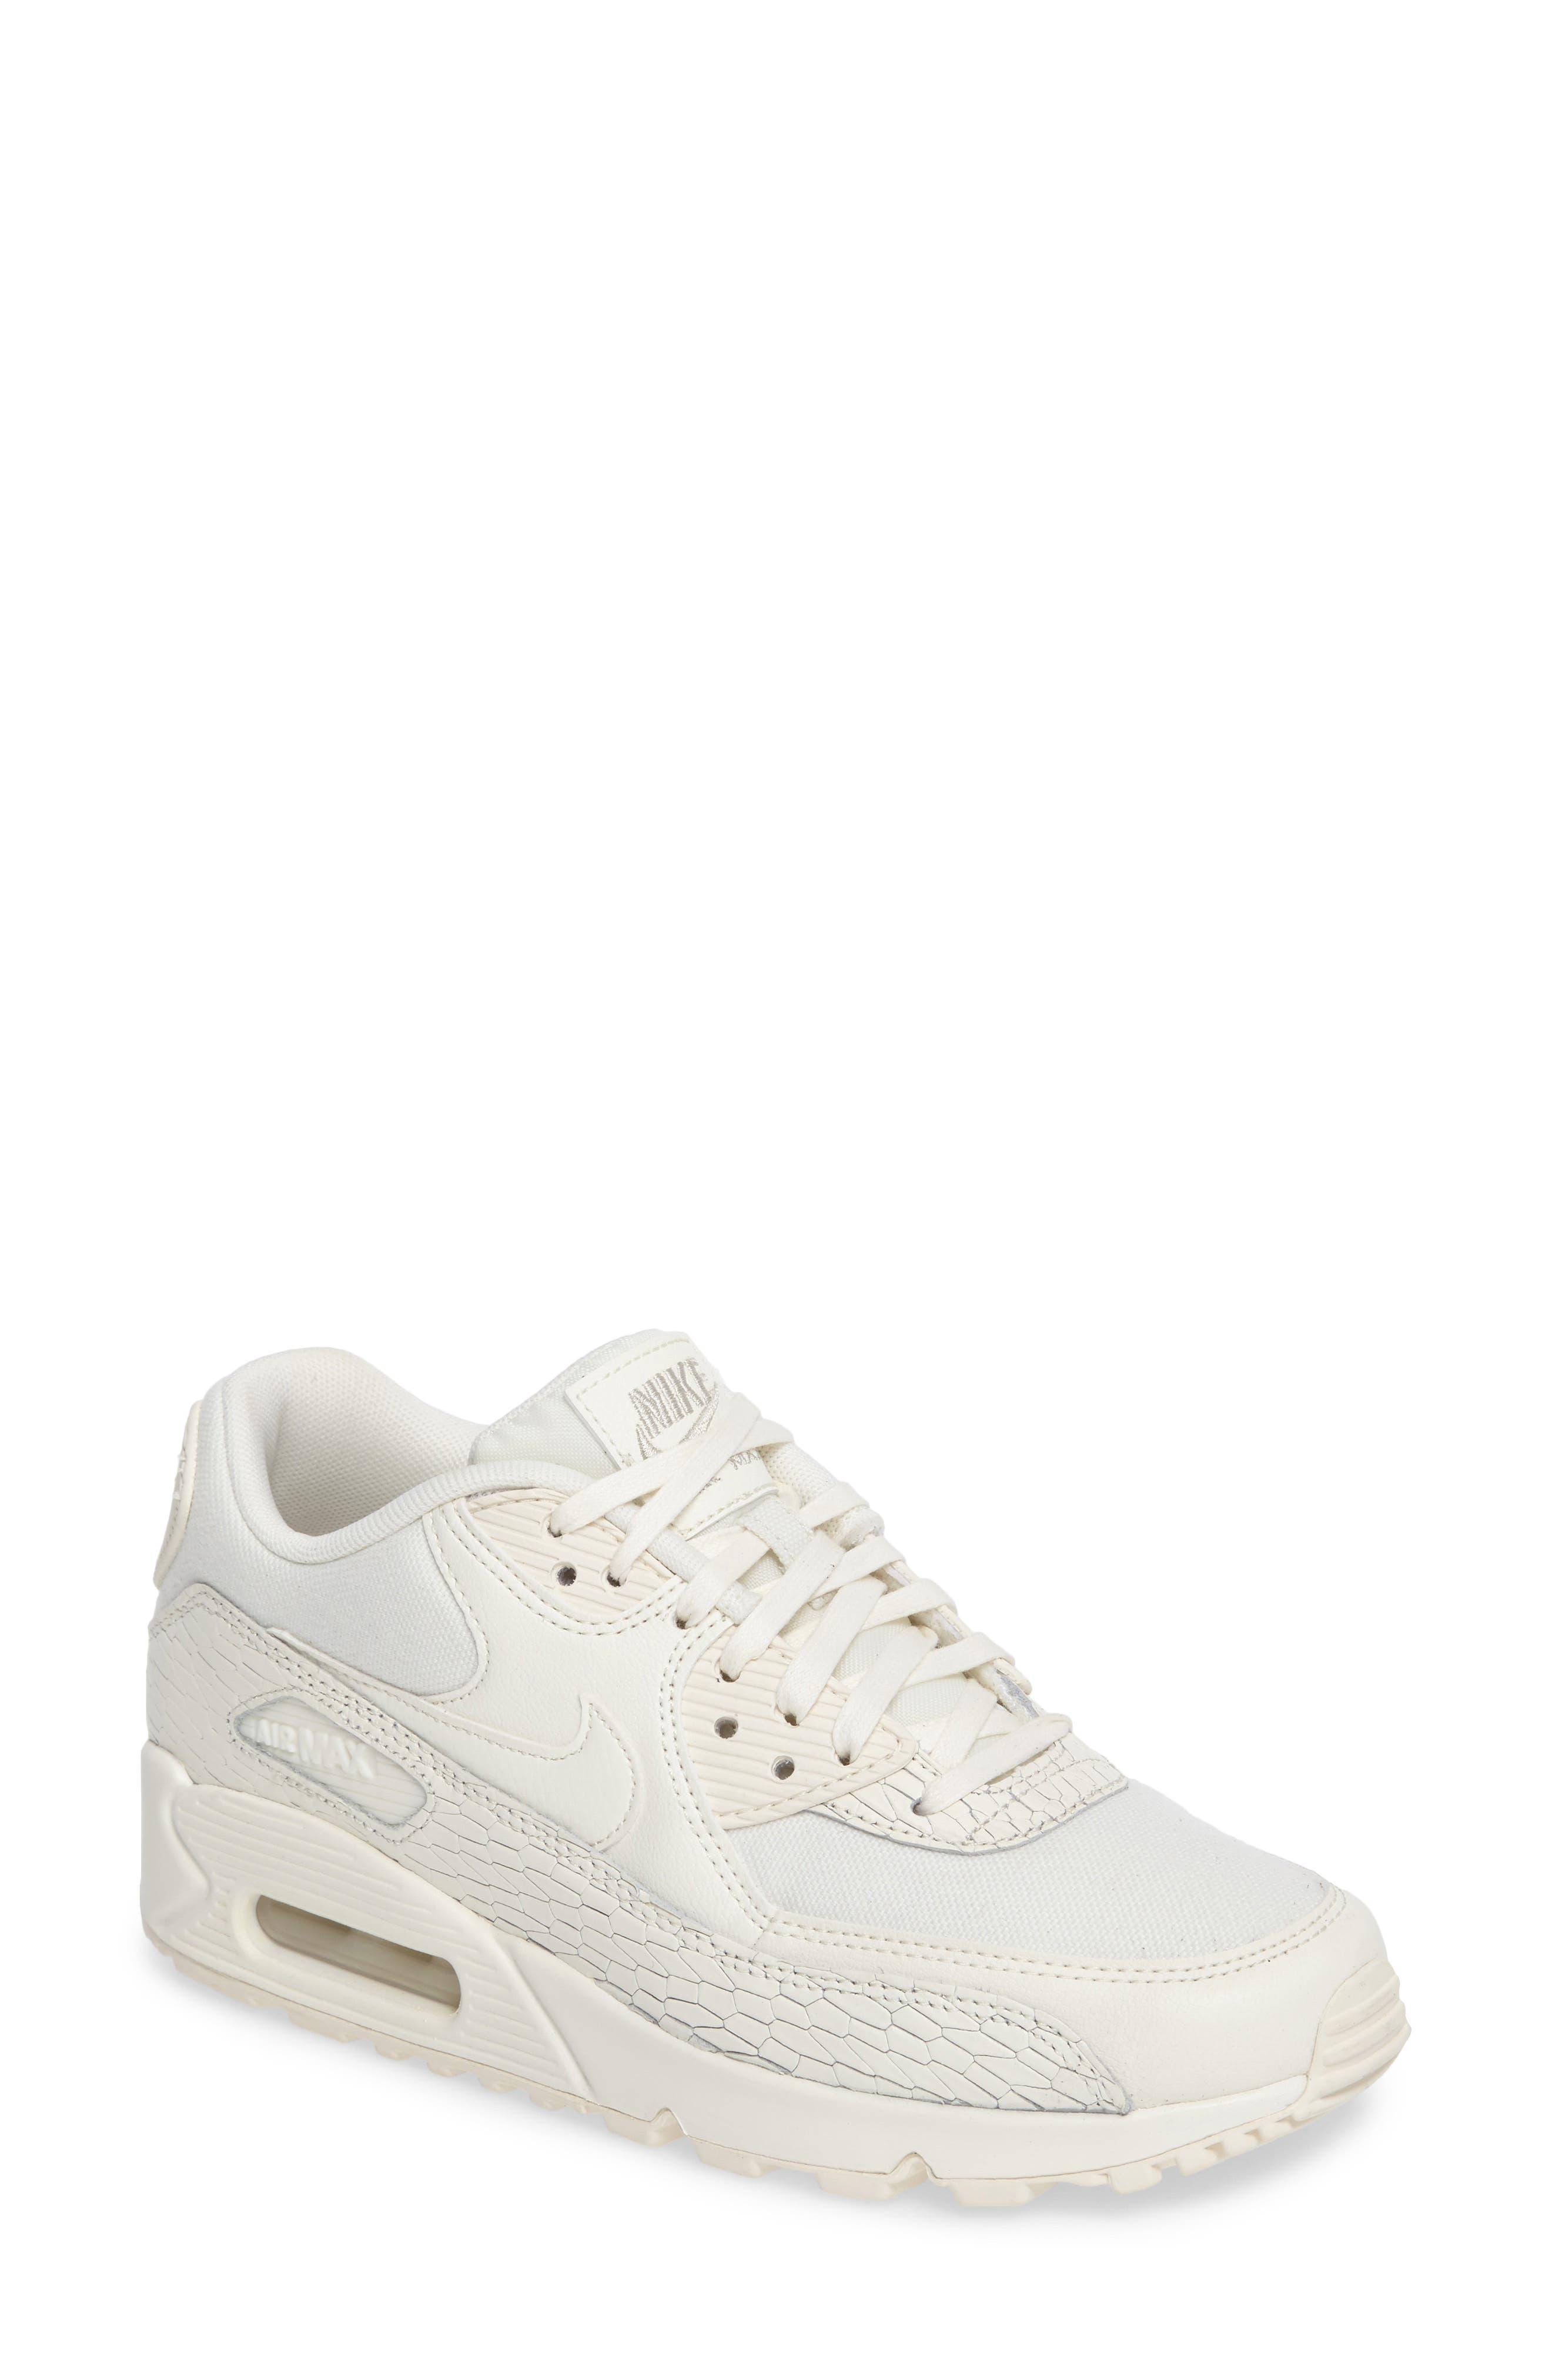 Air Max 90 Premium Leather Sneaker,                             Main thumbnail 1, color,                             250